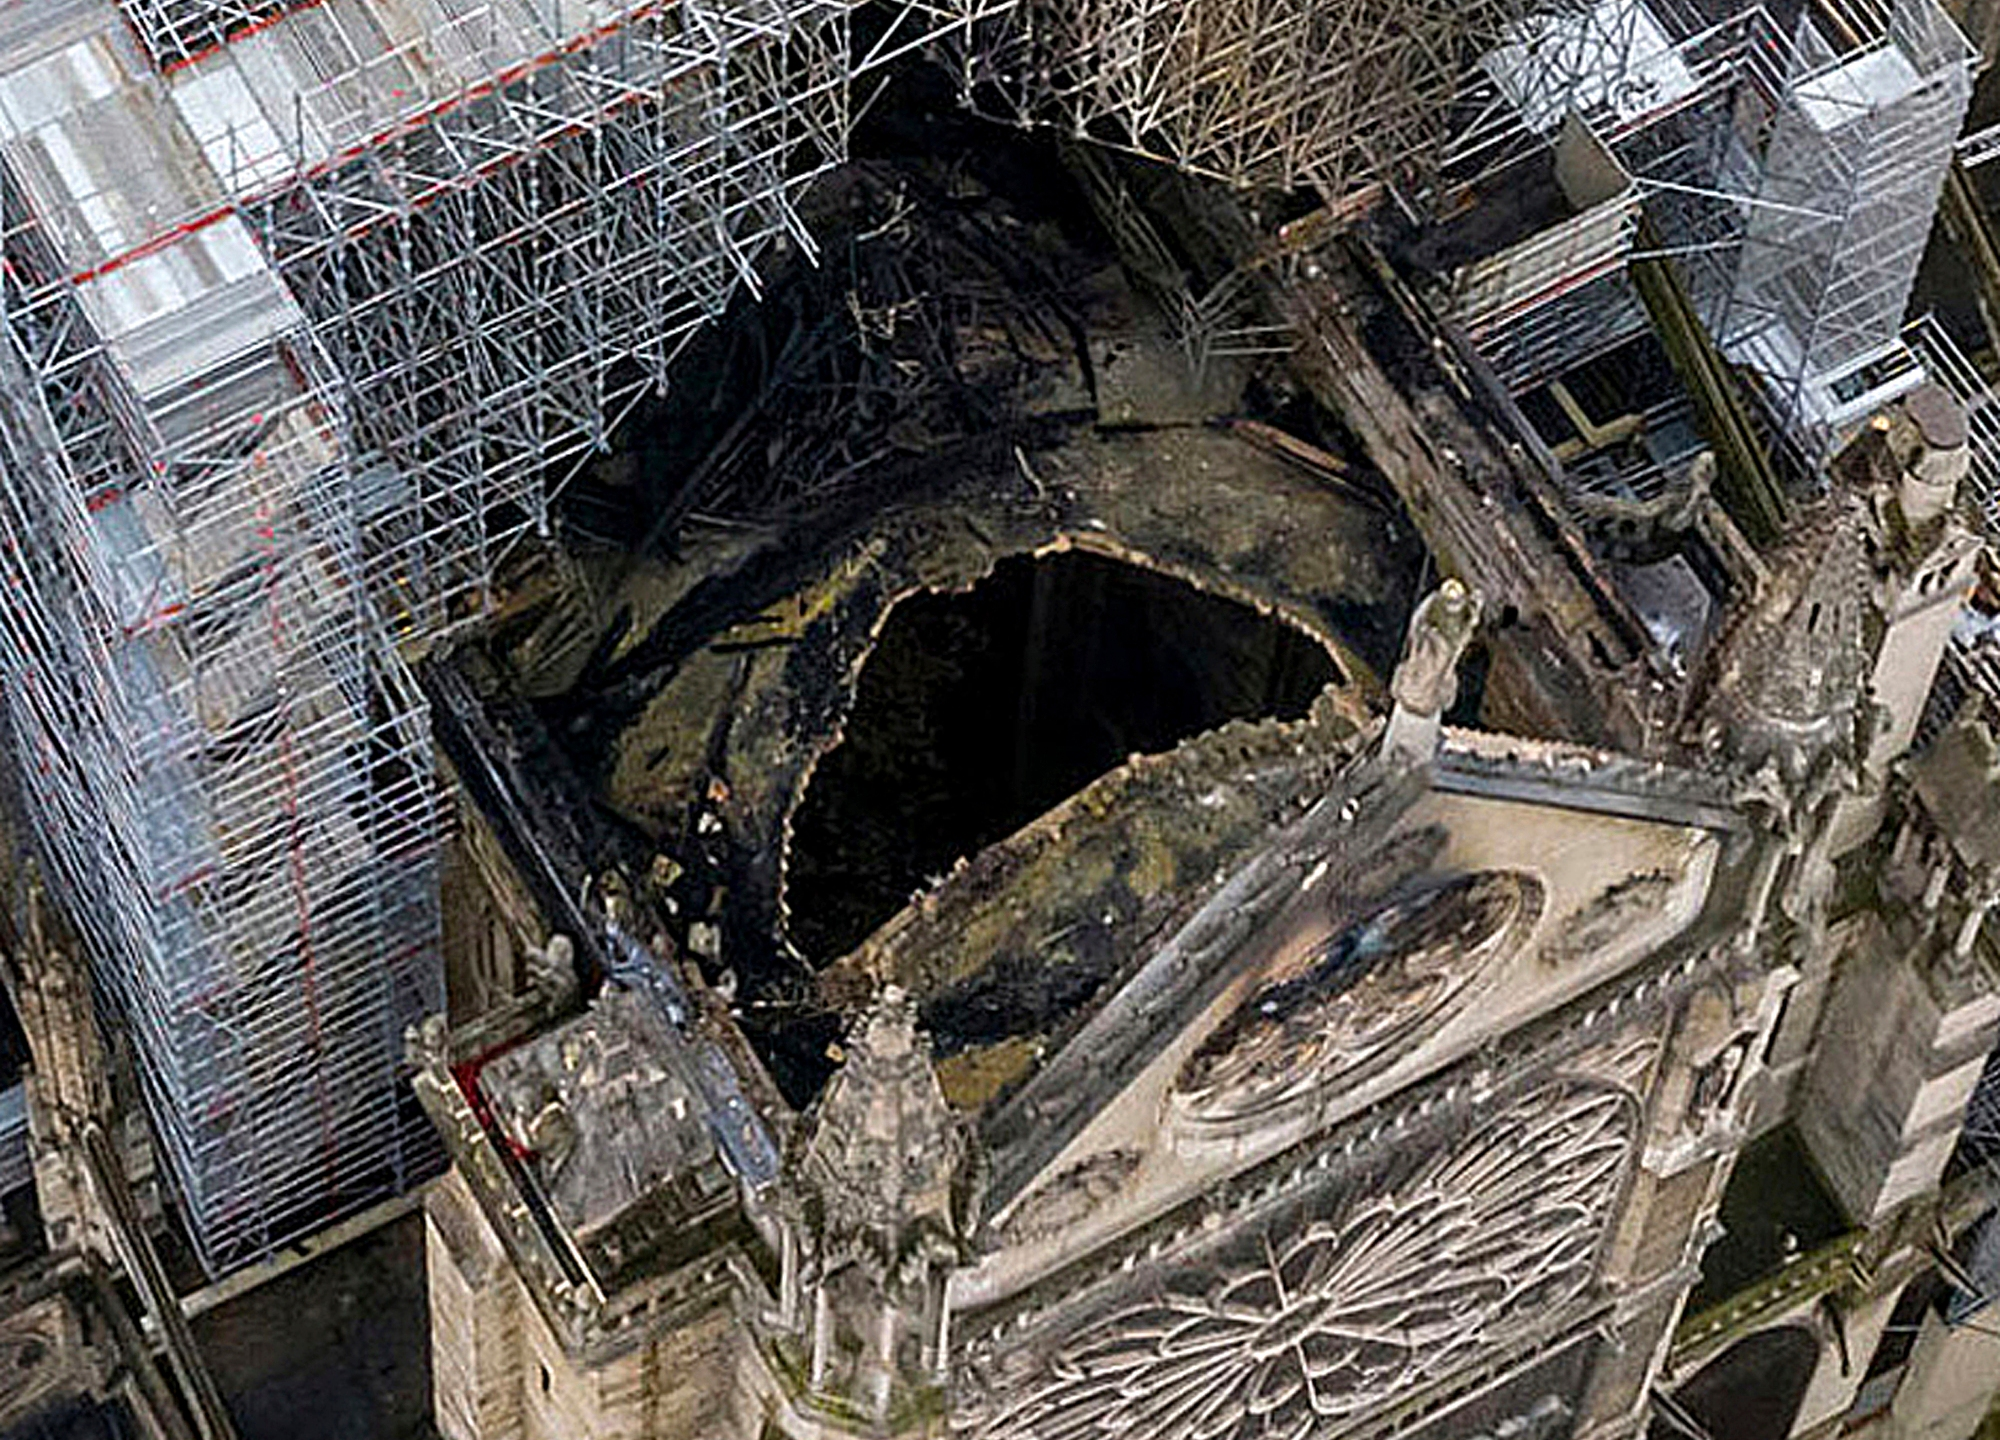 France_Notre_Dame_Fire_93511-159532.jpg17440373